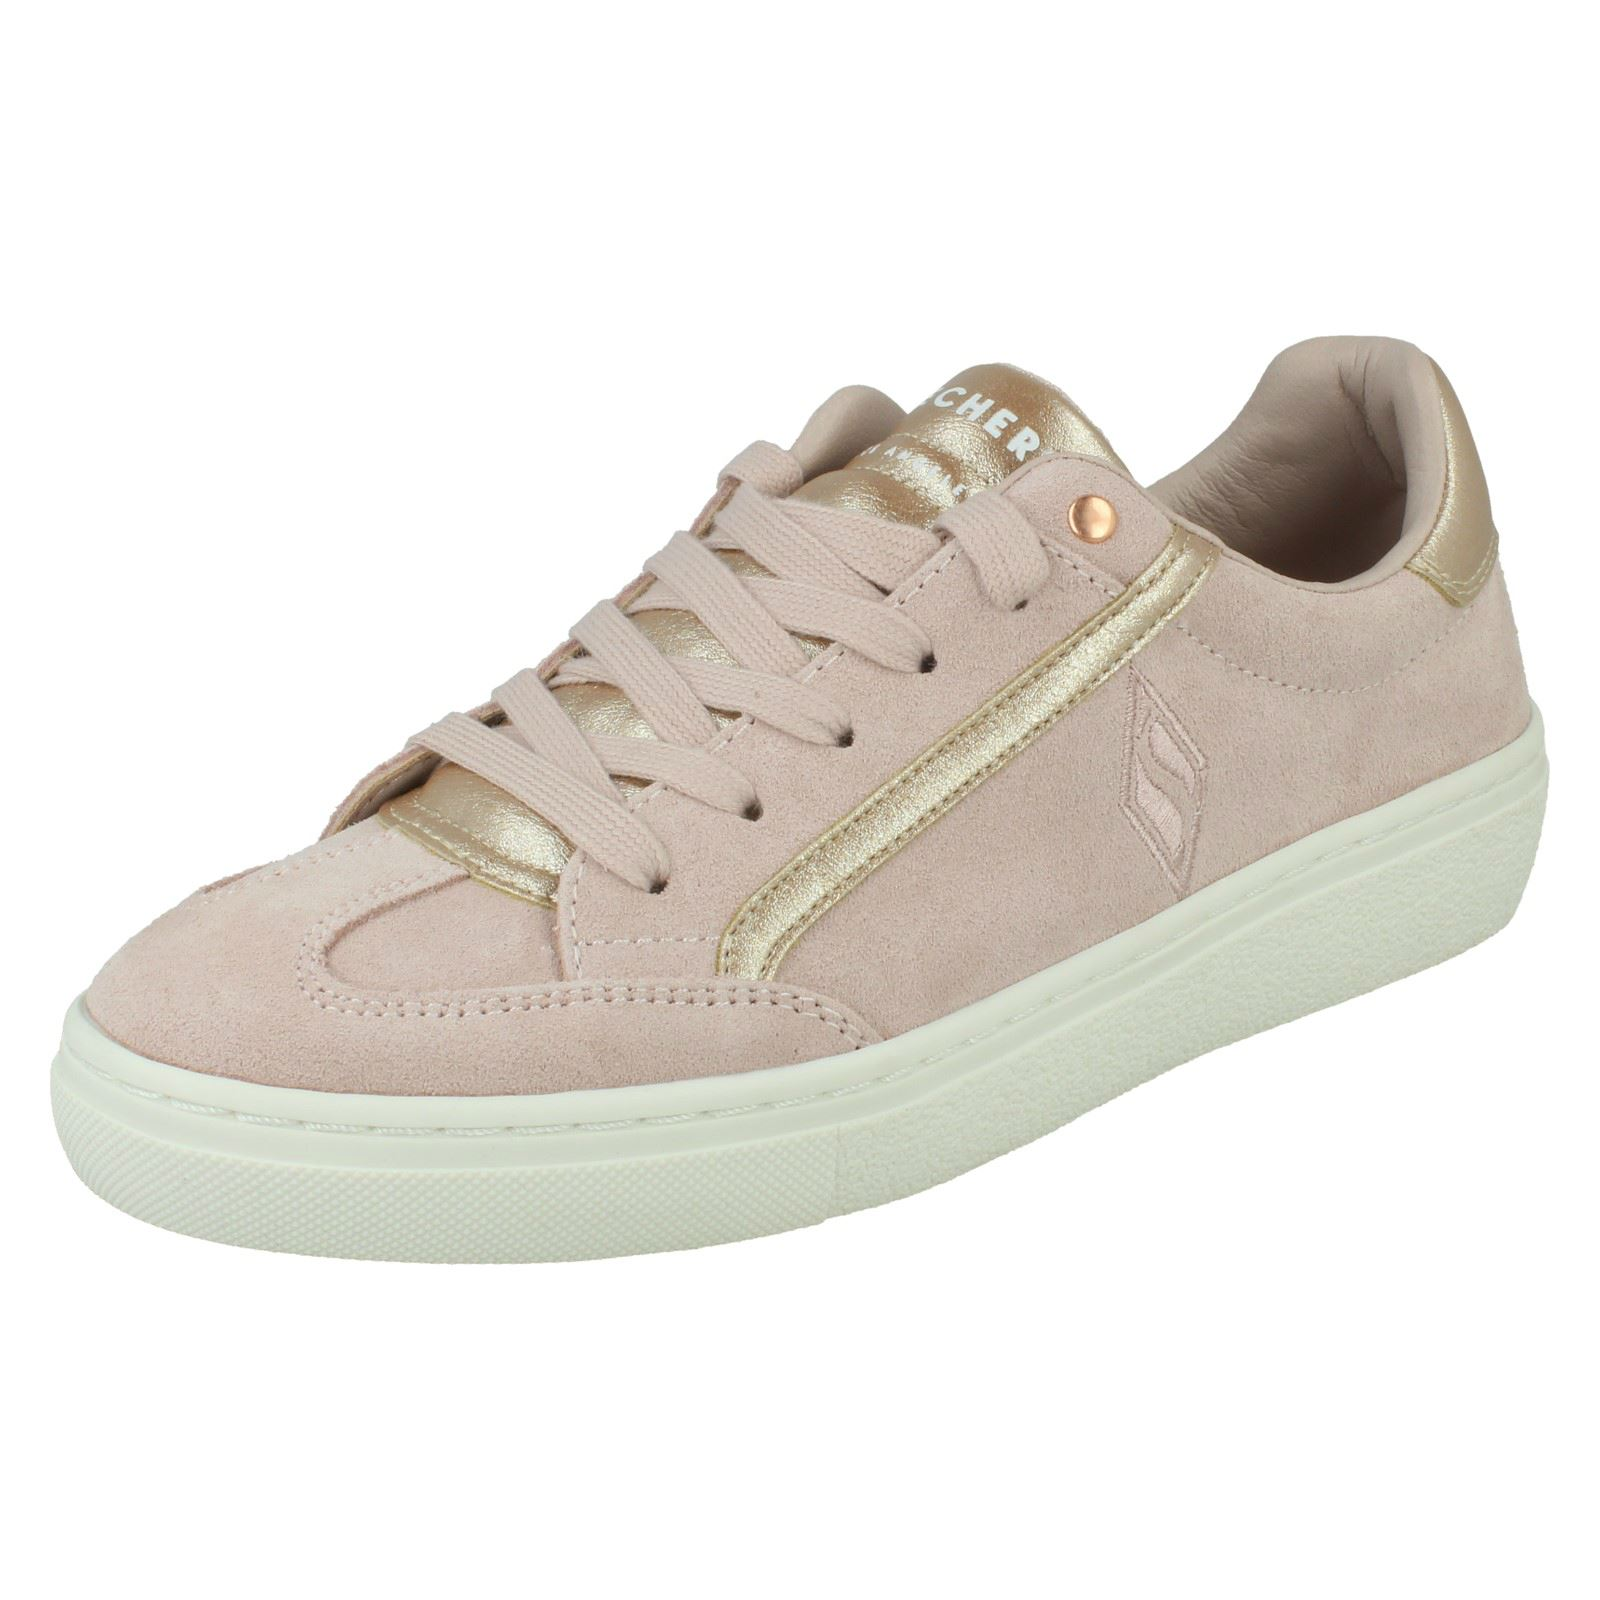 Skechers Femmes Lacets Baskets Décontractées-Pop Shine 74298 Light Pink/Rose Gold (Pink)